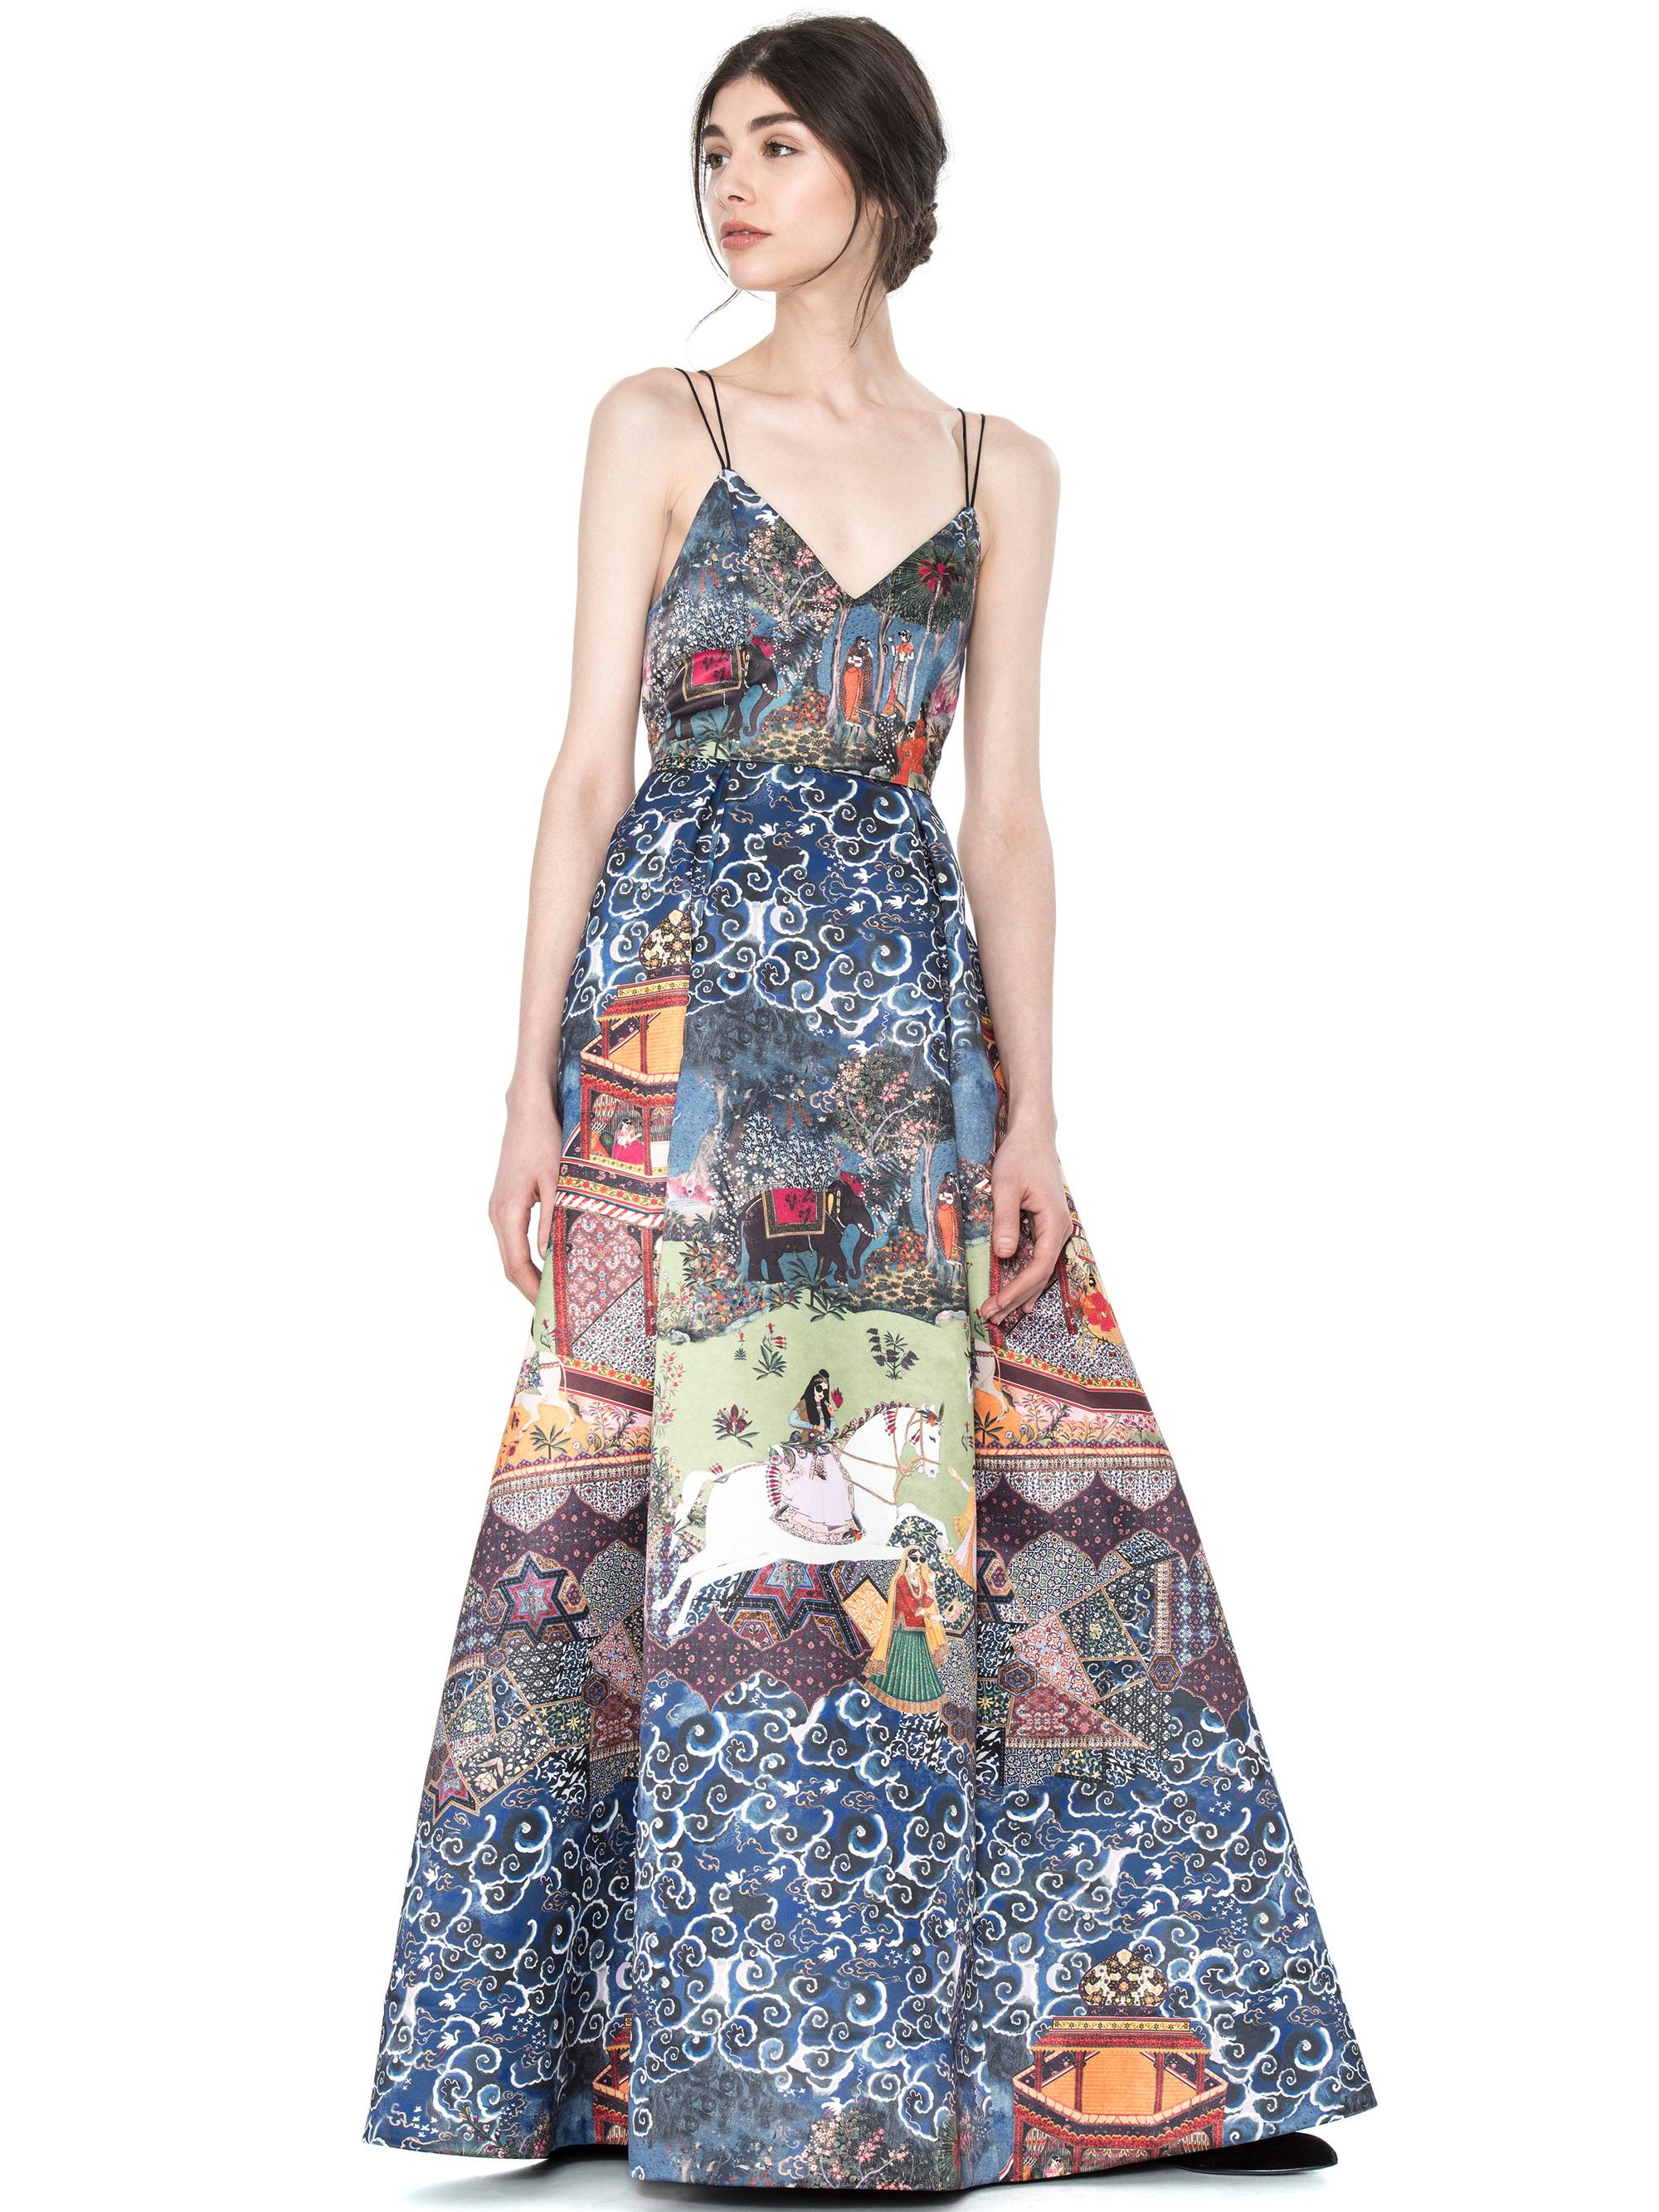 Lyst - Alice + Olivia Marilla V Neck Strappy Gown in Blue